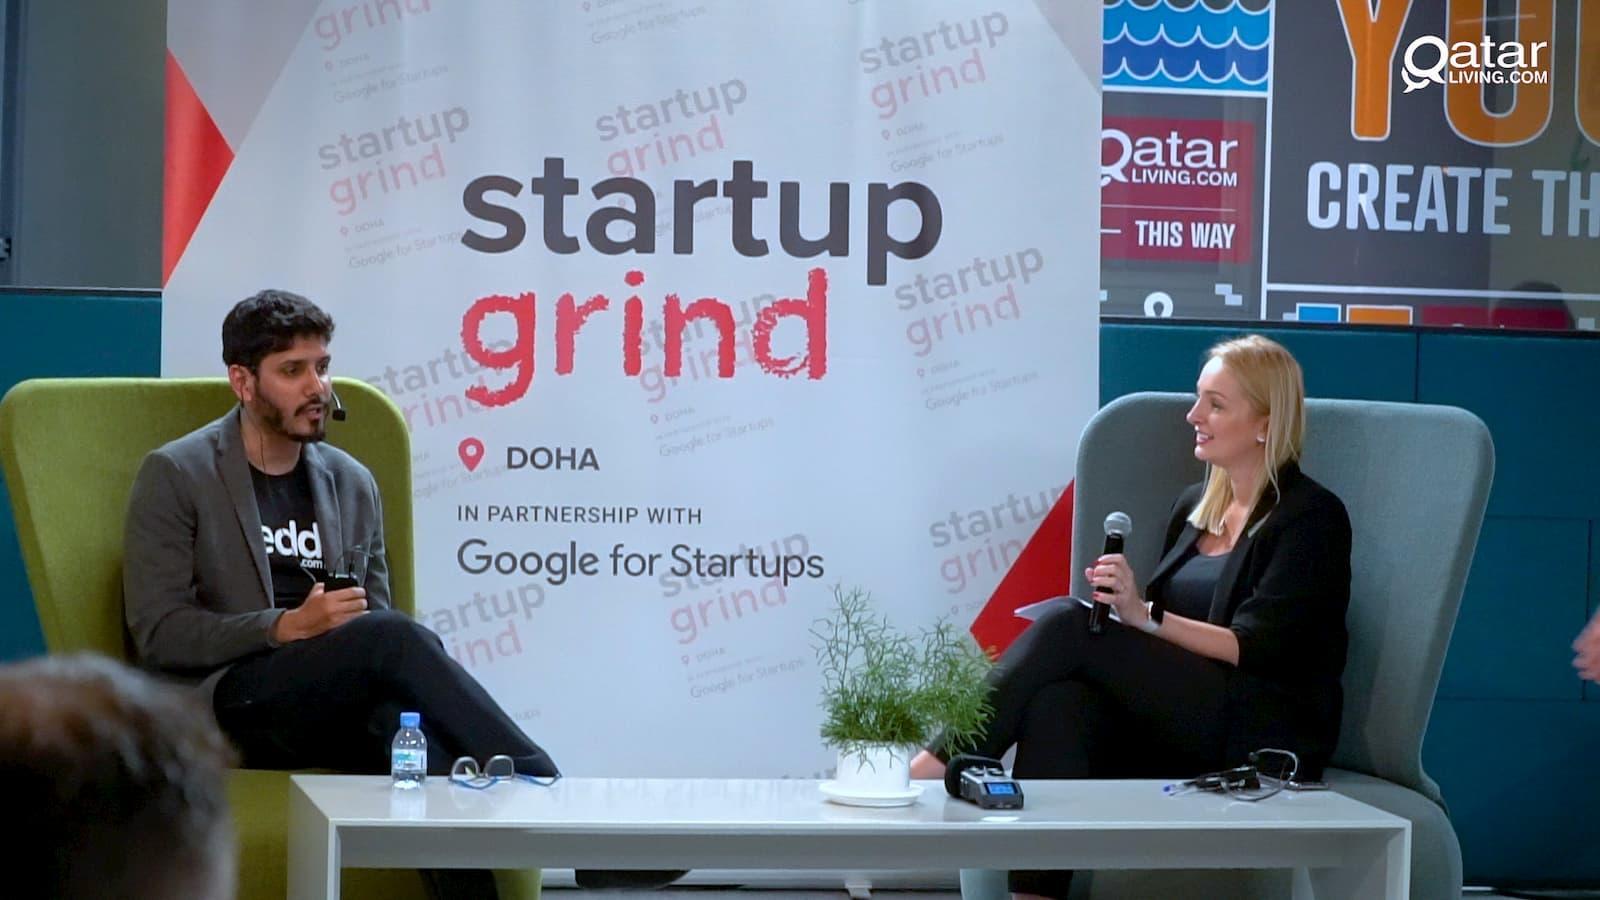 WATCH: Startup Grind Doha